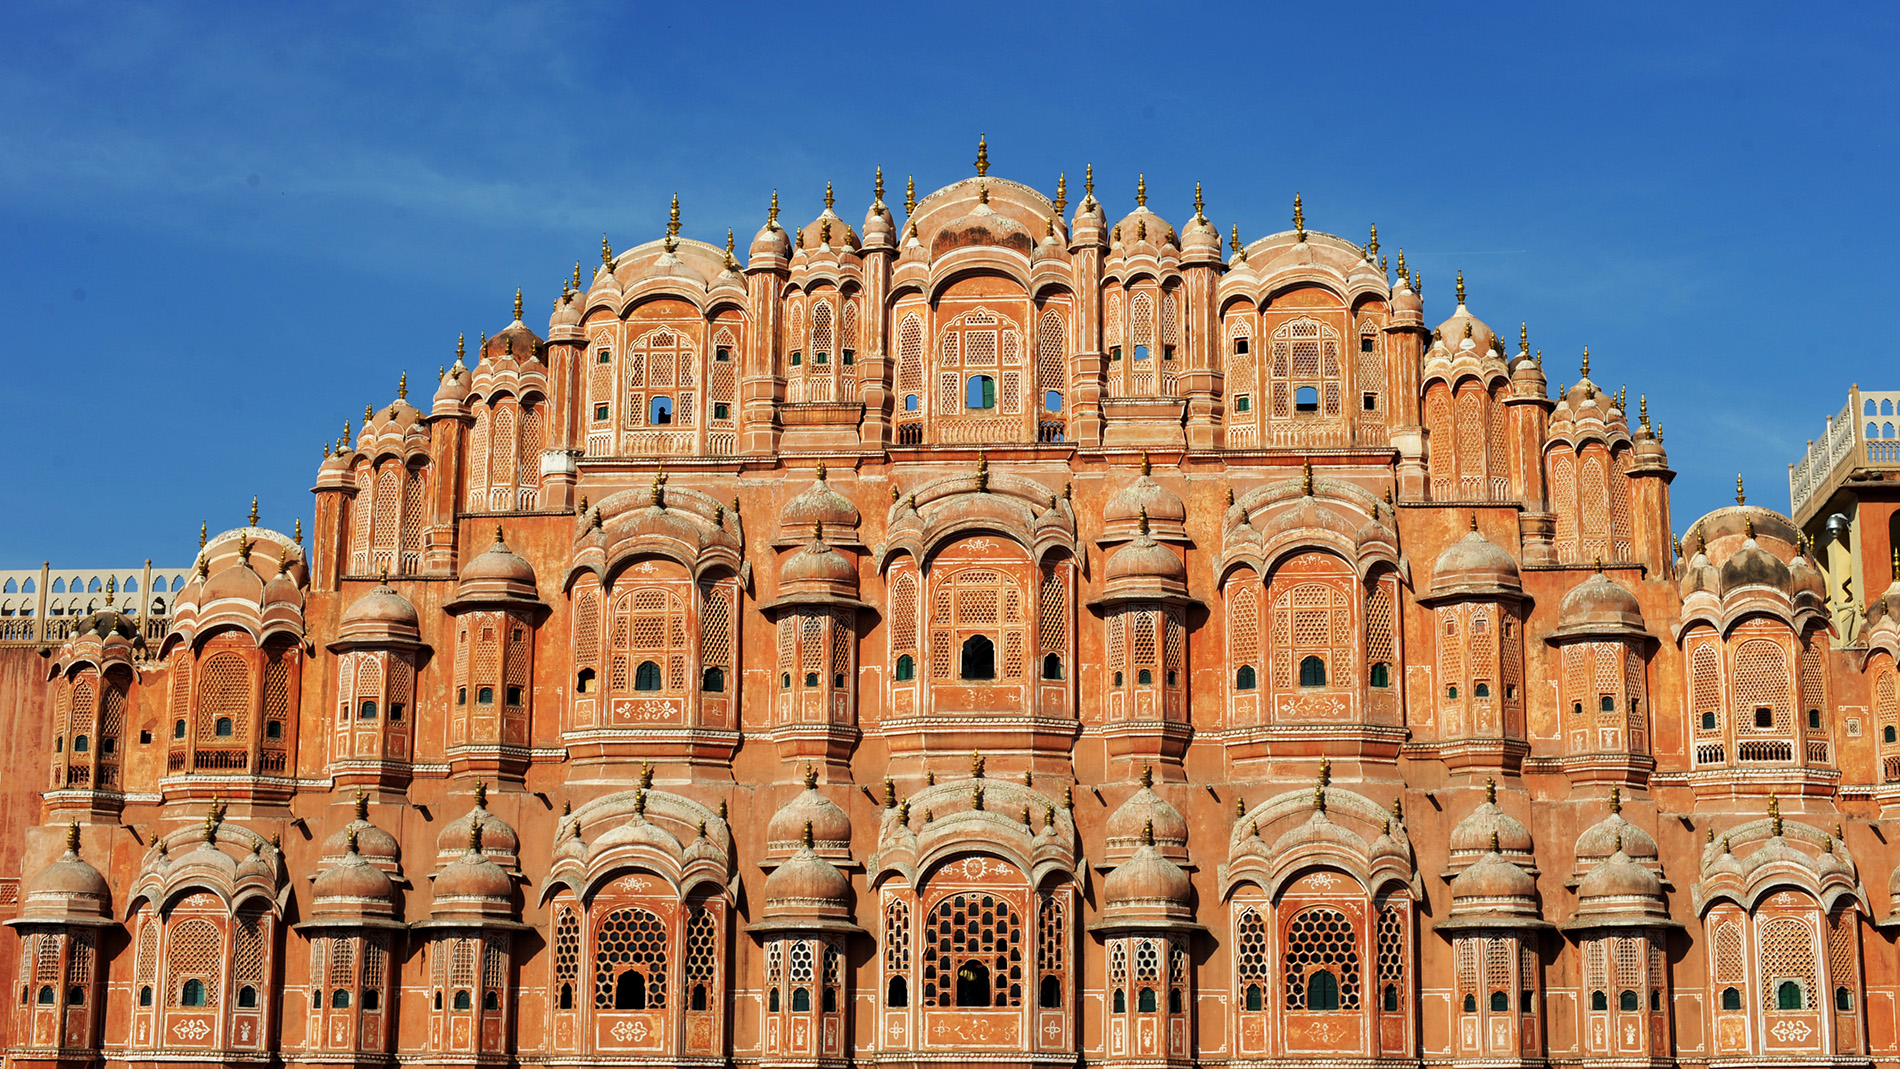 10 classic Indianisms | CNN Travel